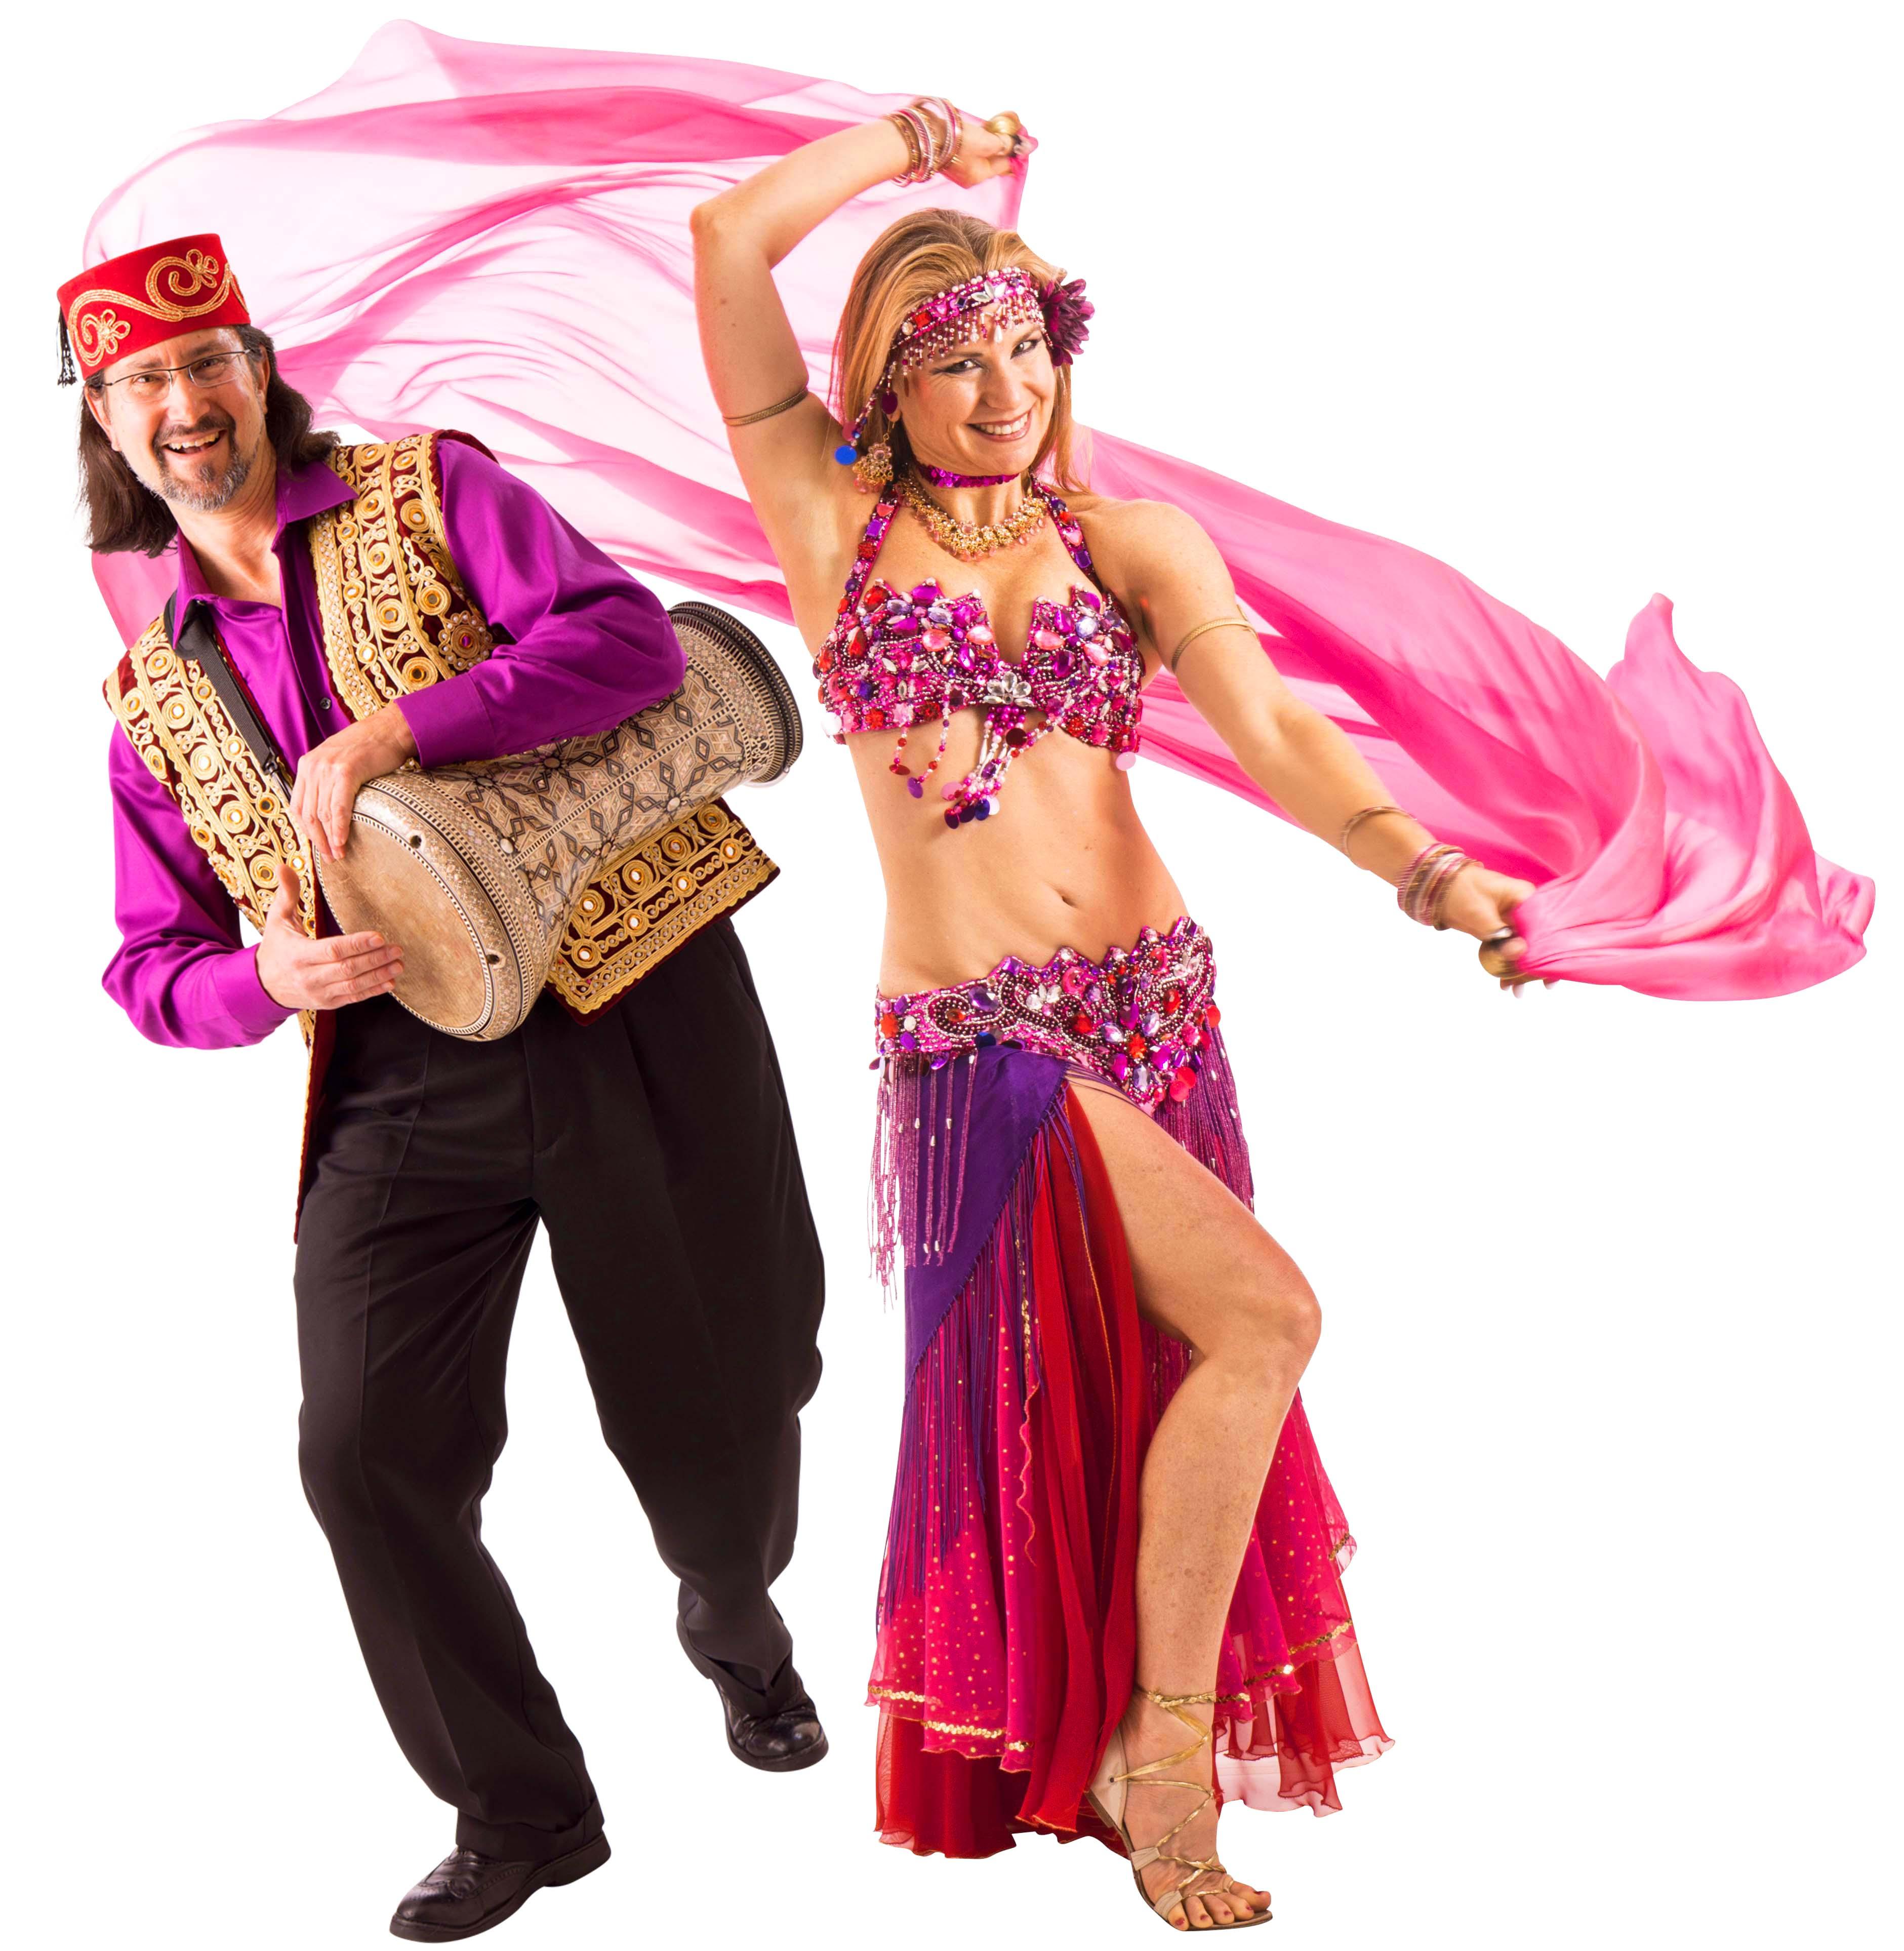 portrait of professional belly dancer Jensuya and drummer Robert Peak